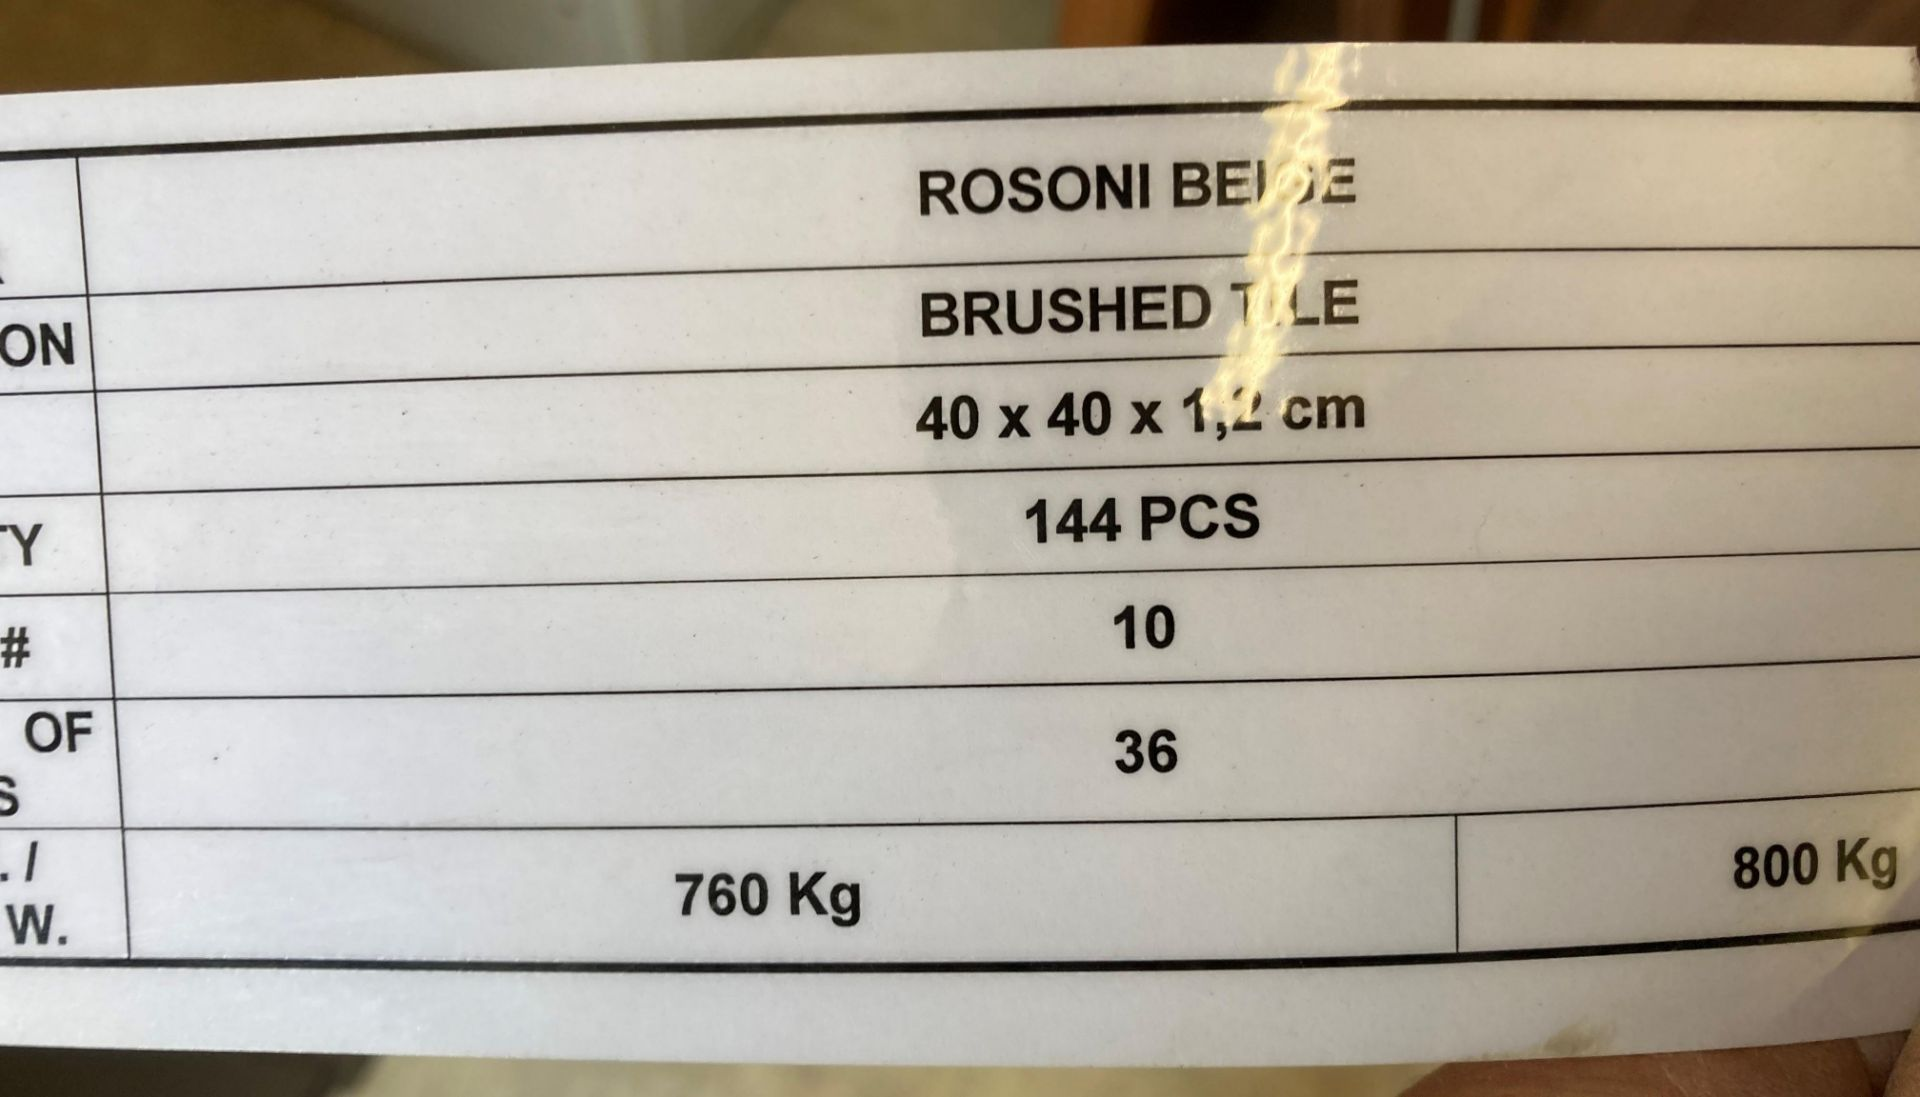 36 x packs of 4 Rosoni beige brushed tiles - 40 x 40 x 1.